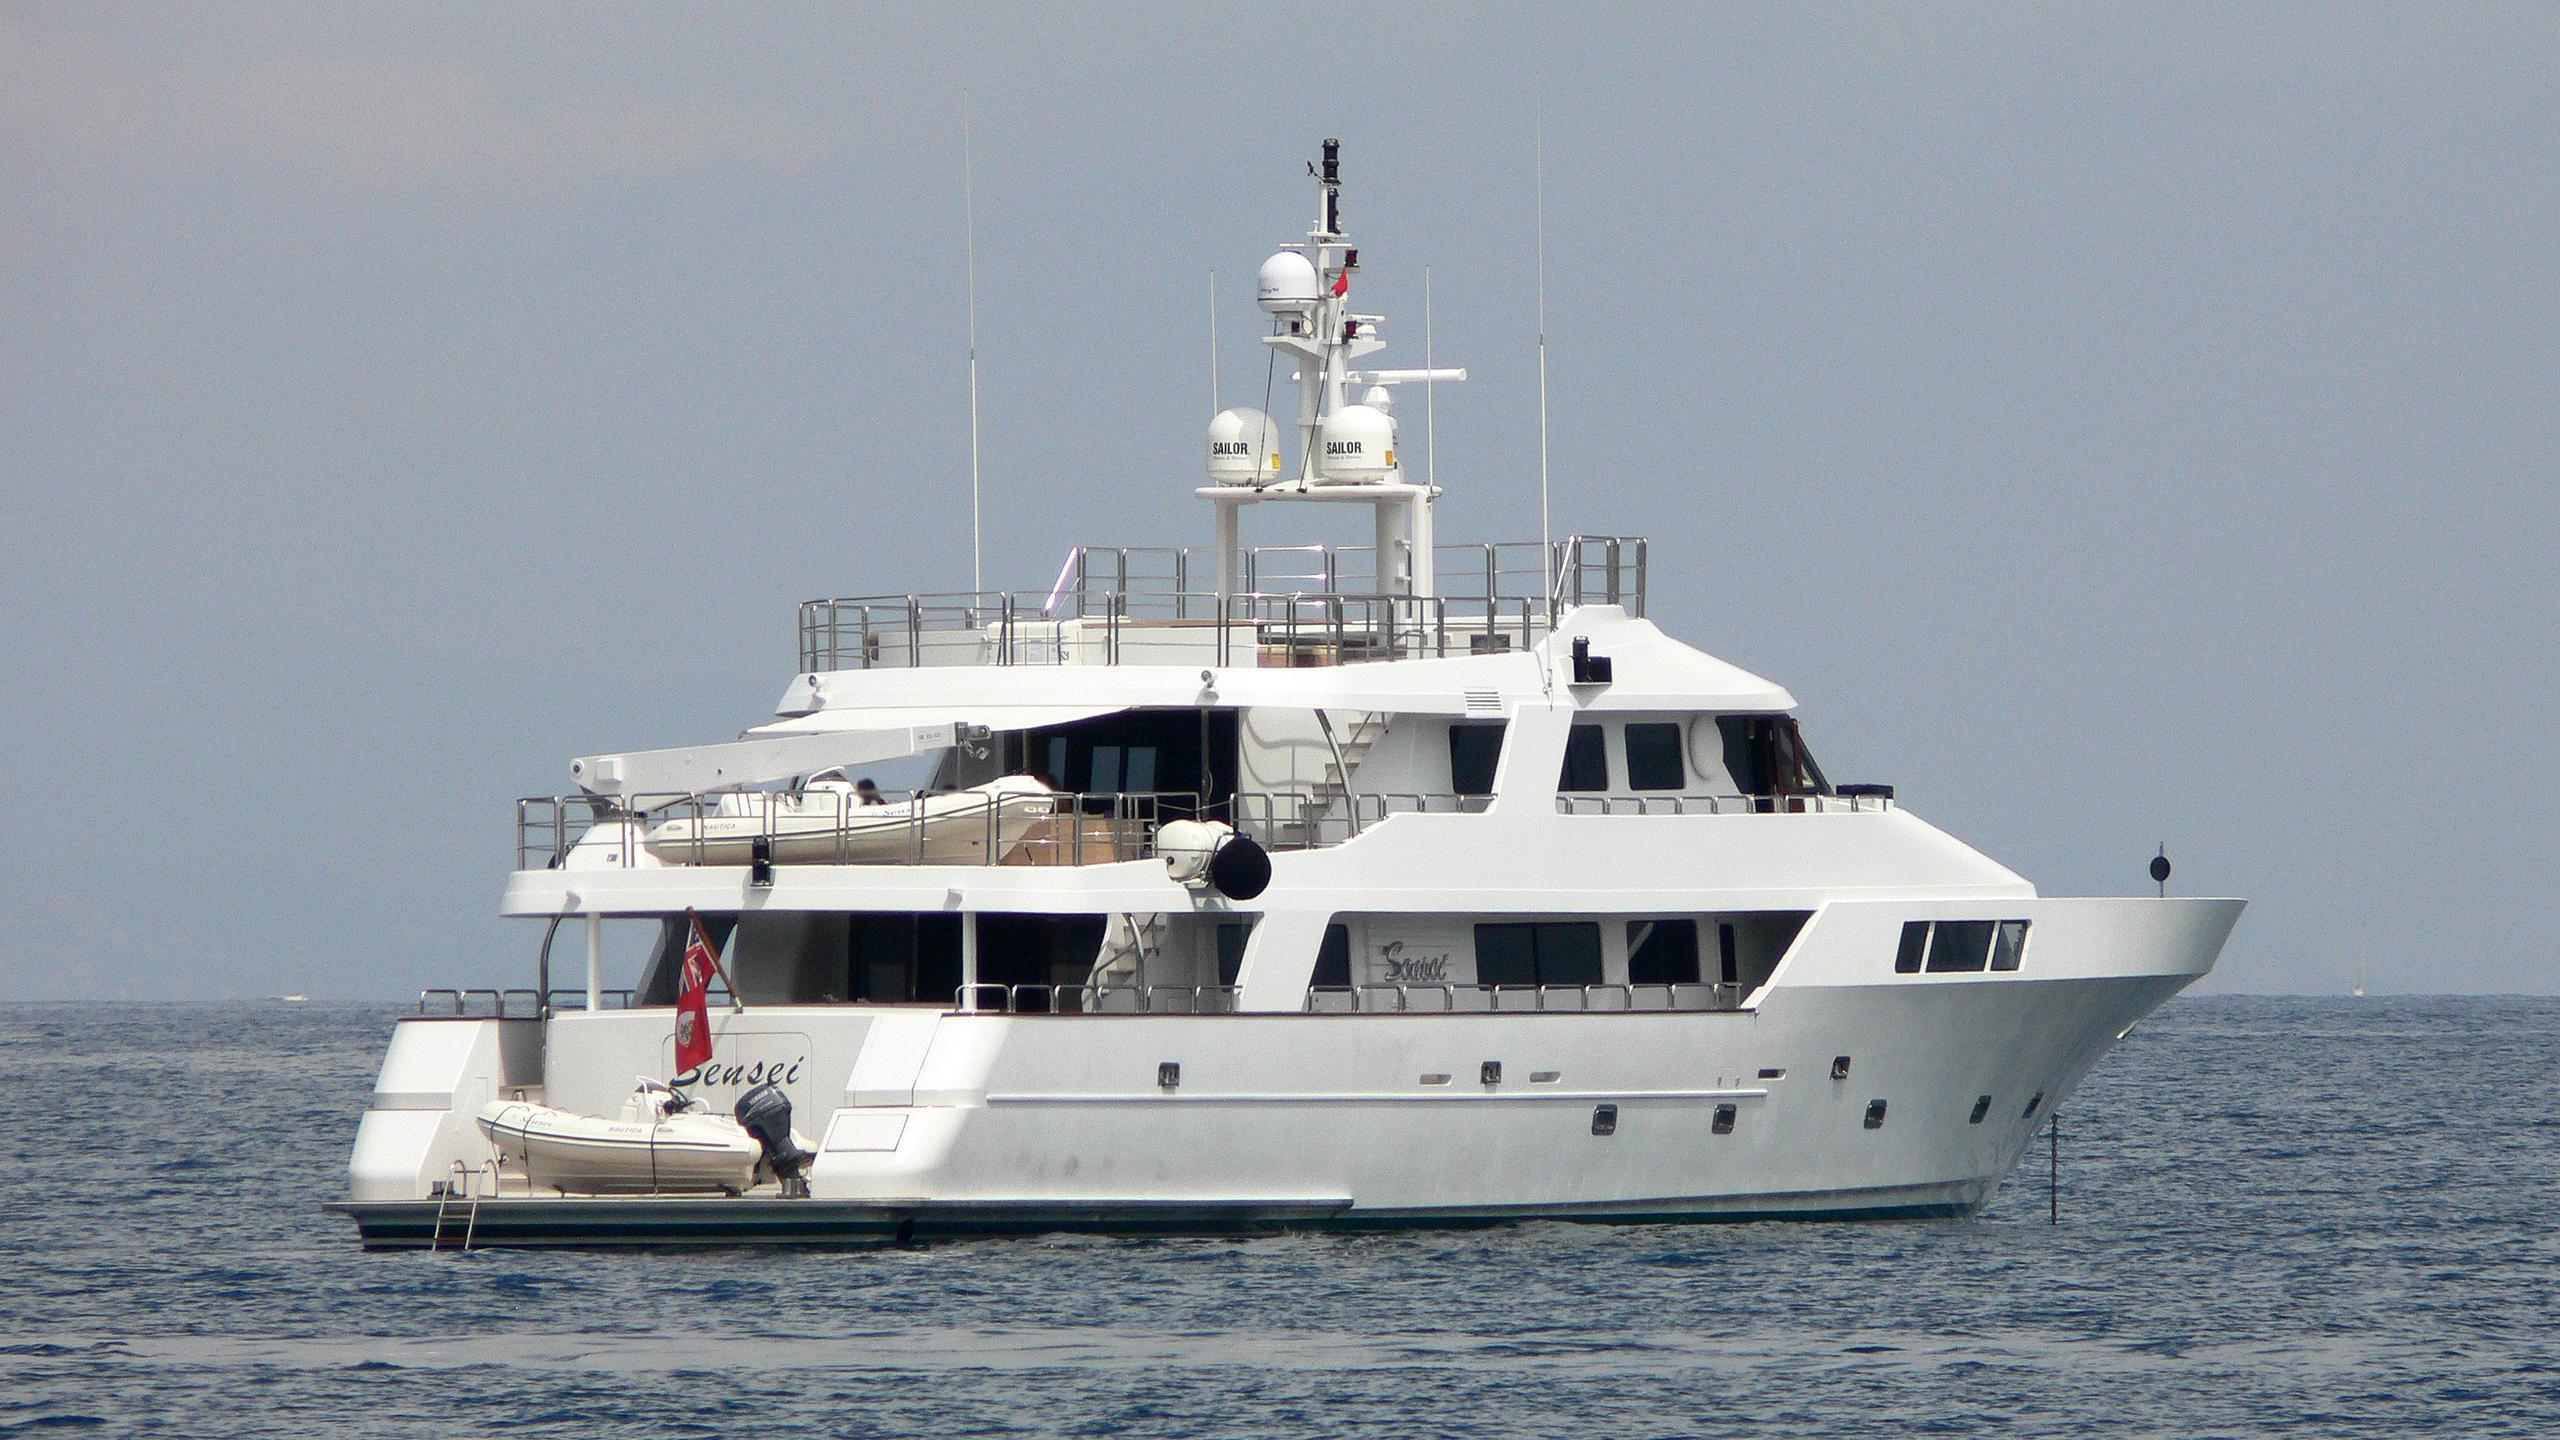 sensei-motor-yacht-mitsubishi-hi-1991-38m-stern